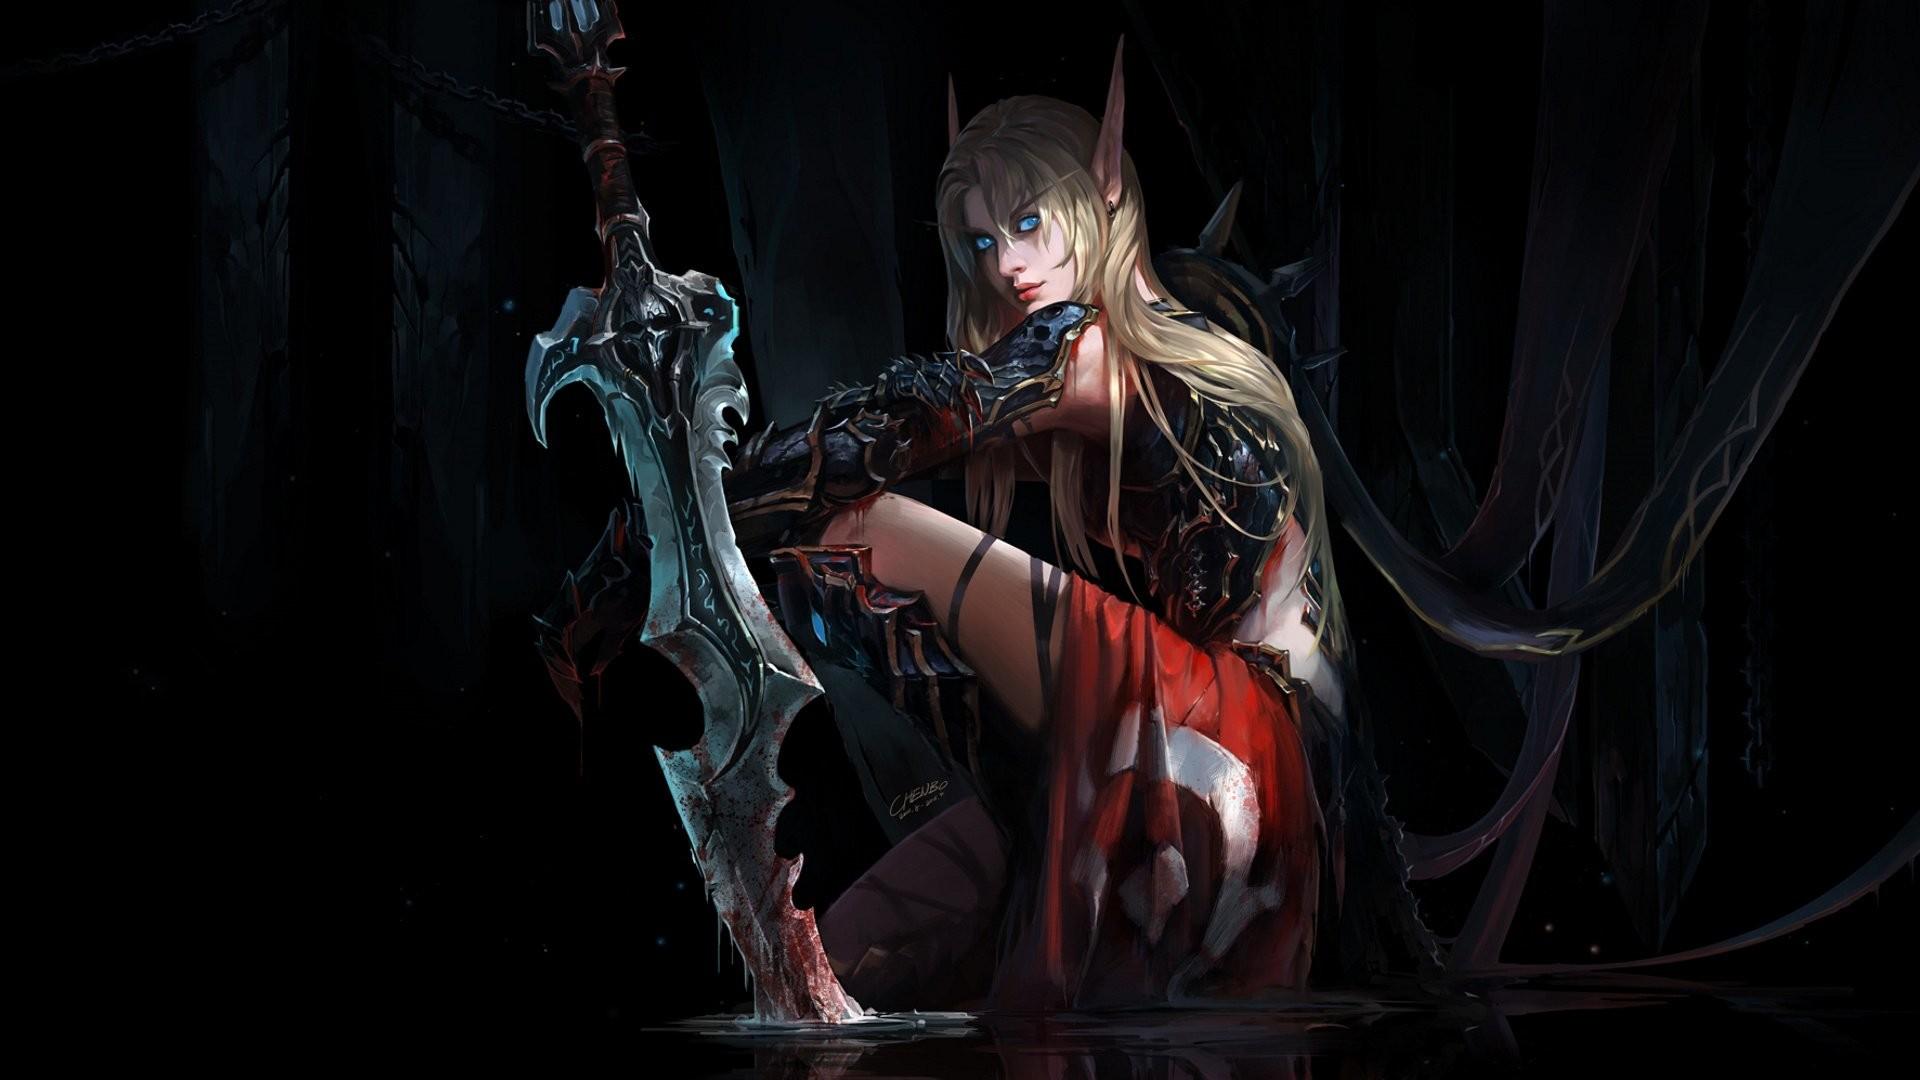 Blood elf death knight | death knight | Pinterest | The o'jays .